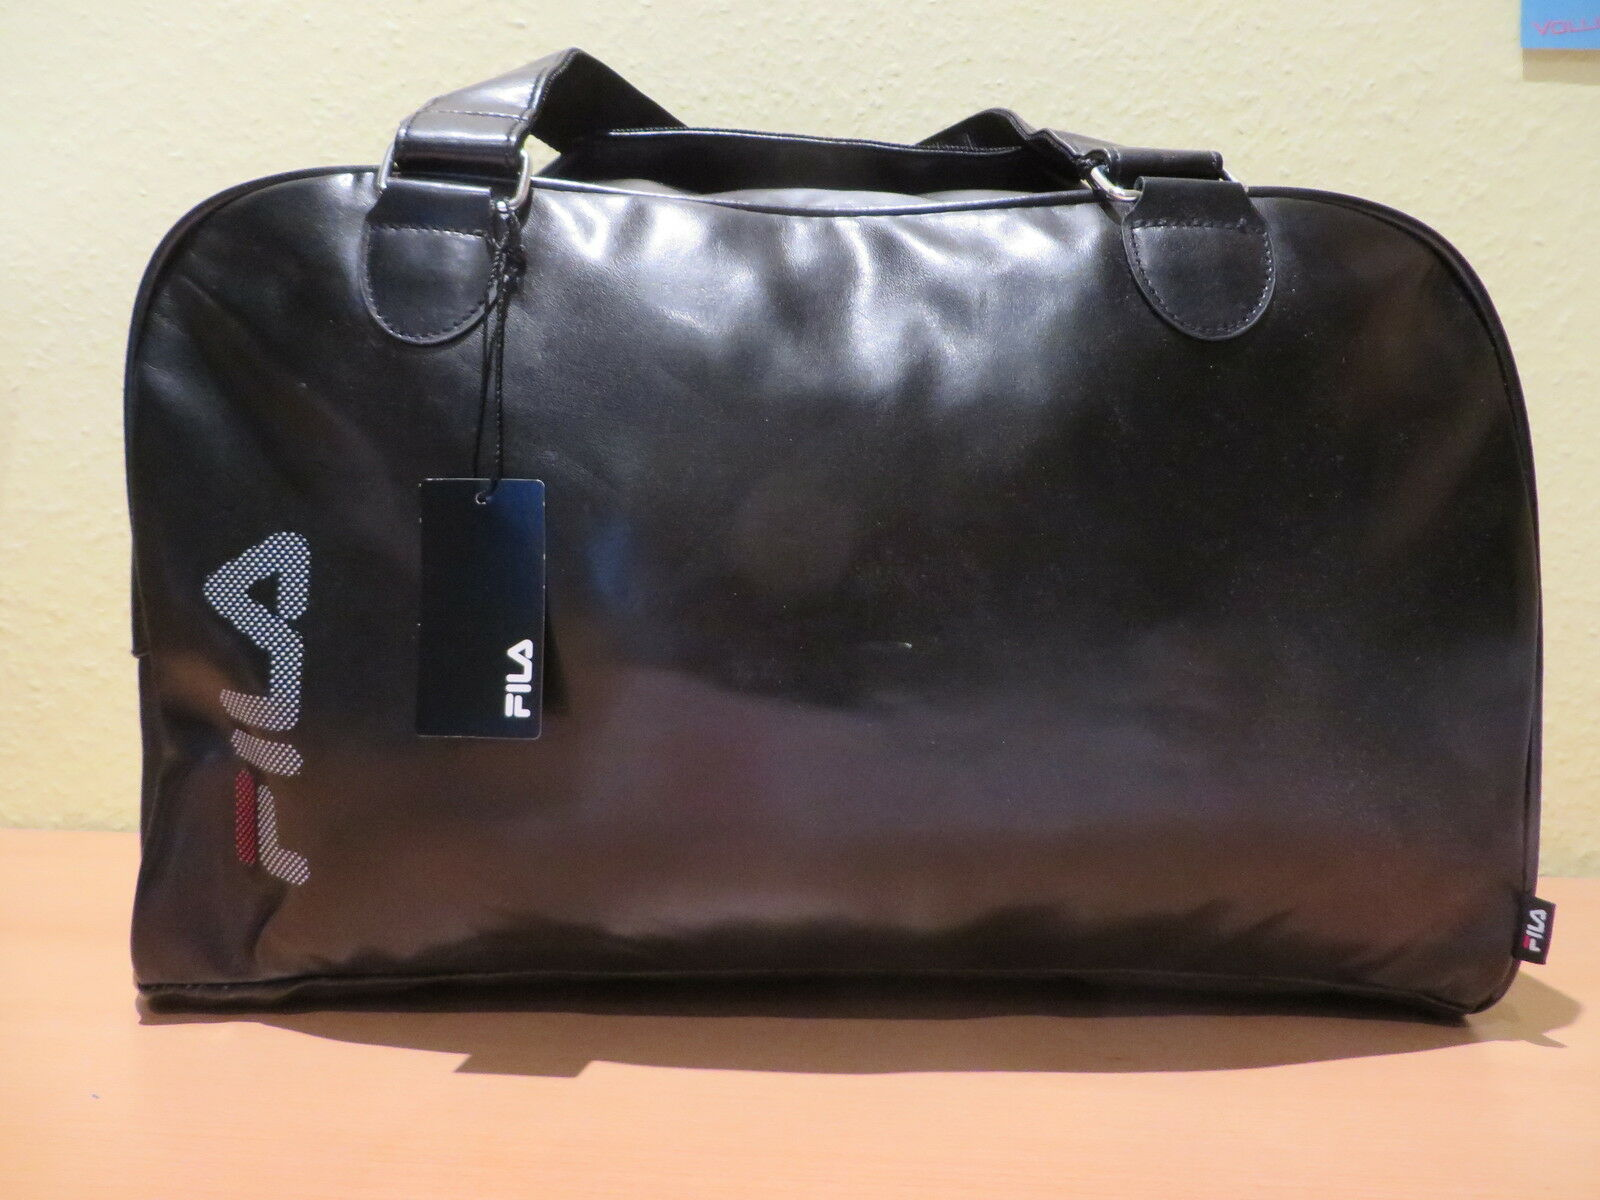 NEU FILA Sporttasche Tasche Reisetasche Messenger Bag Business Edel black NEU